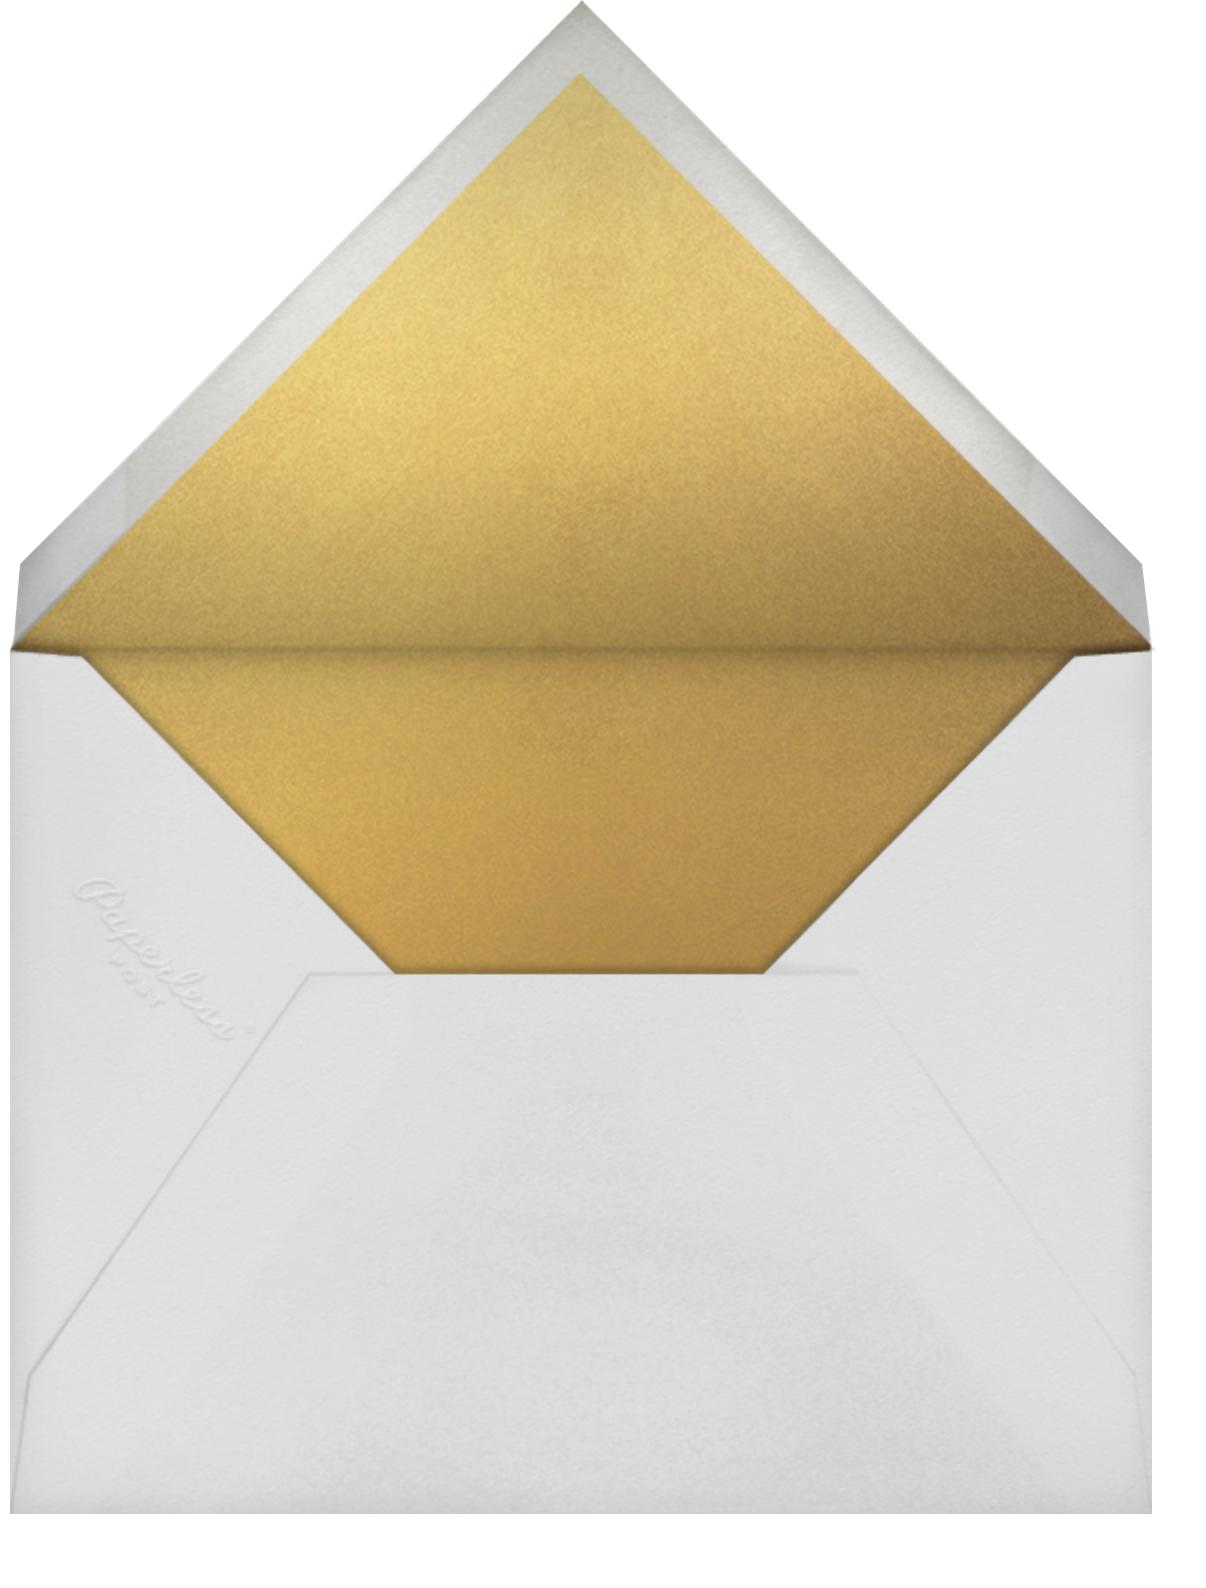 Wreath of Stars Photo - Paperless Post - Envelope